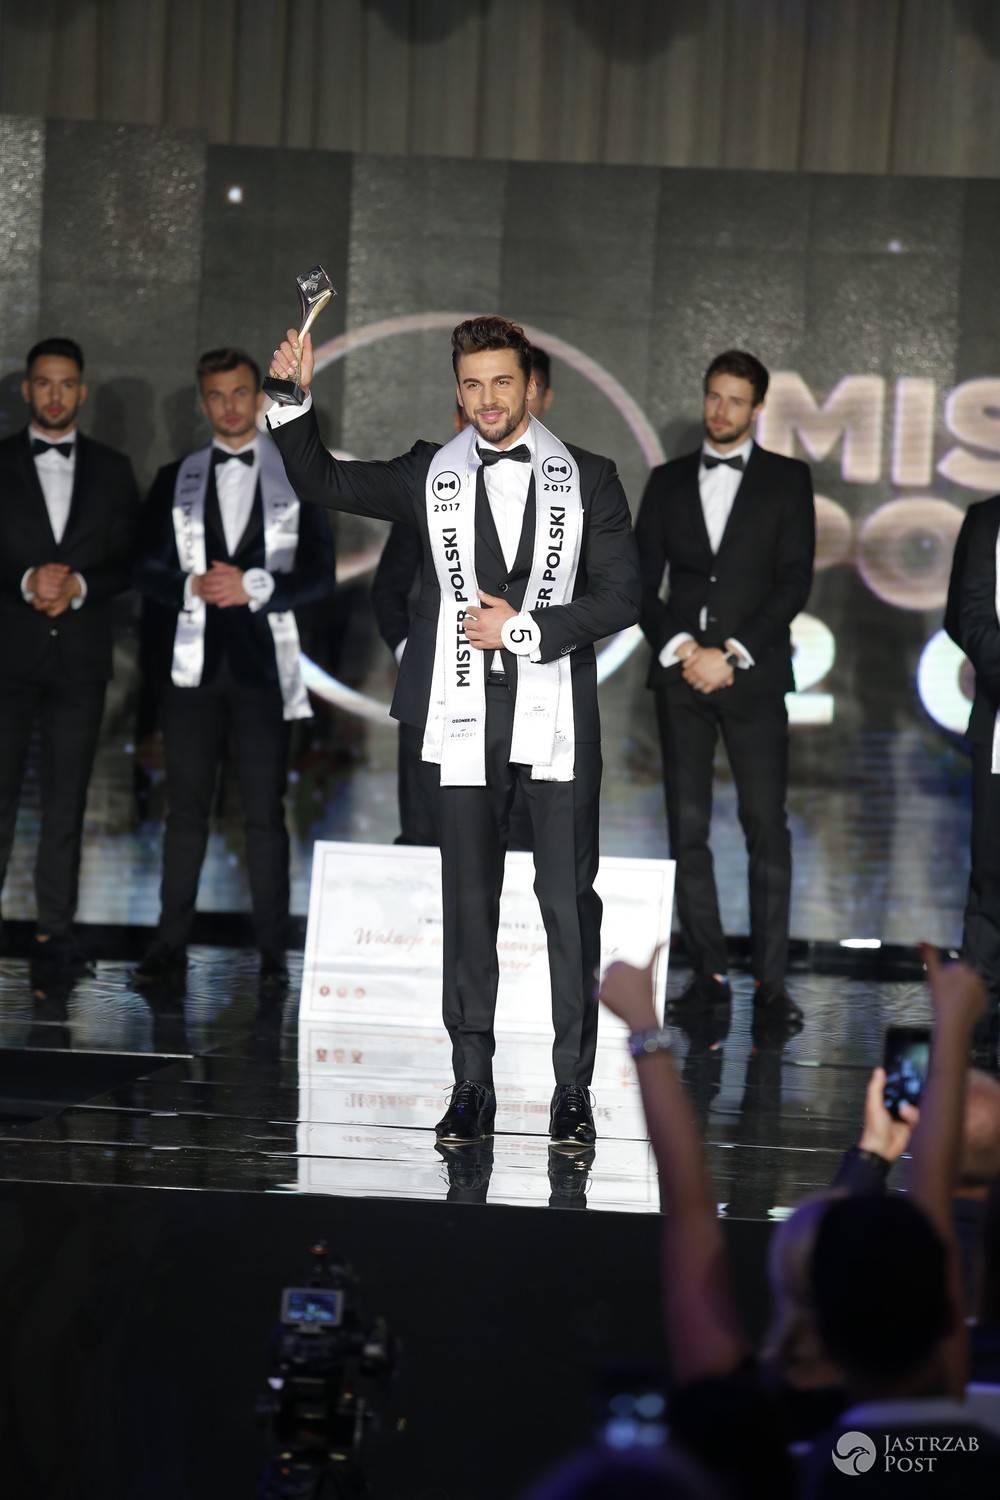 Jakub Kucner (POLAND GLOBAL & SUPRANATIONAL 2018) Akpa20170903_mister_pp_12368